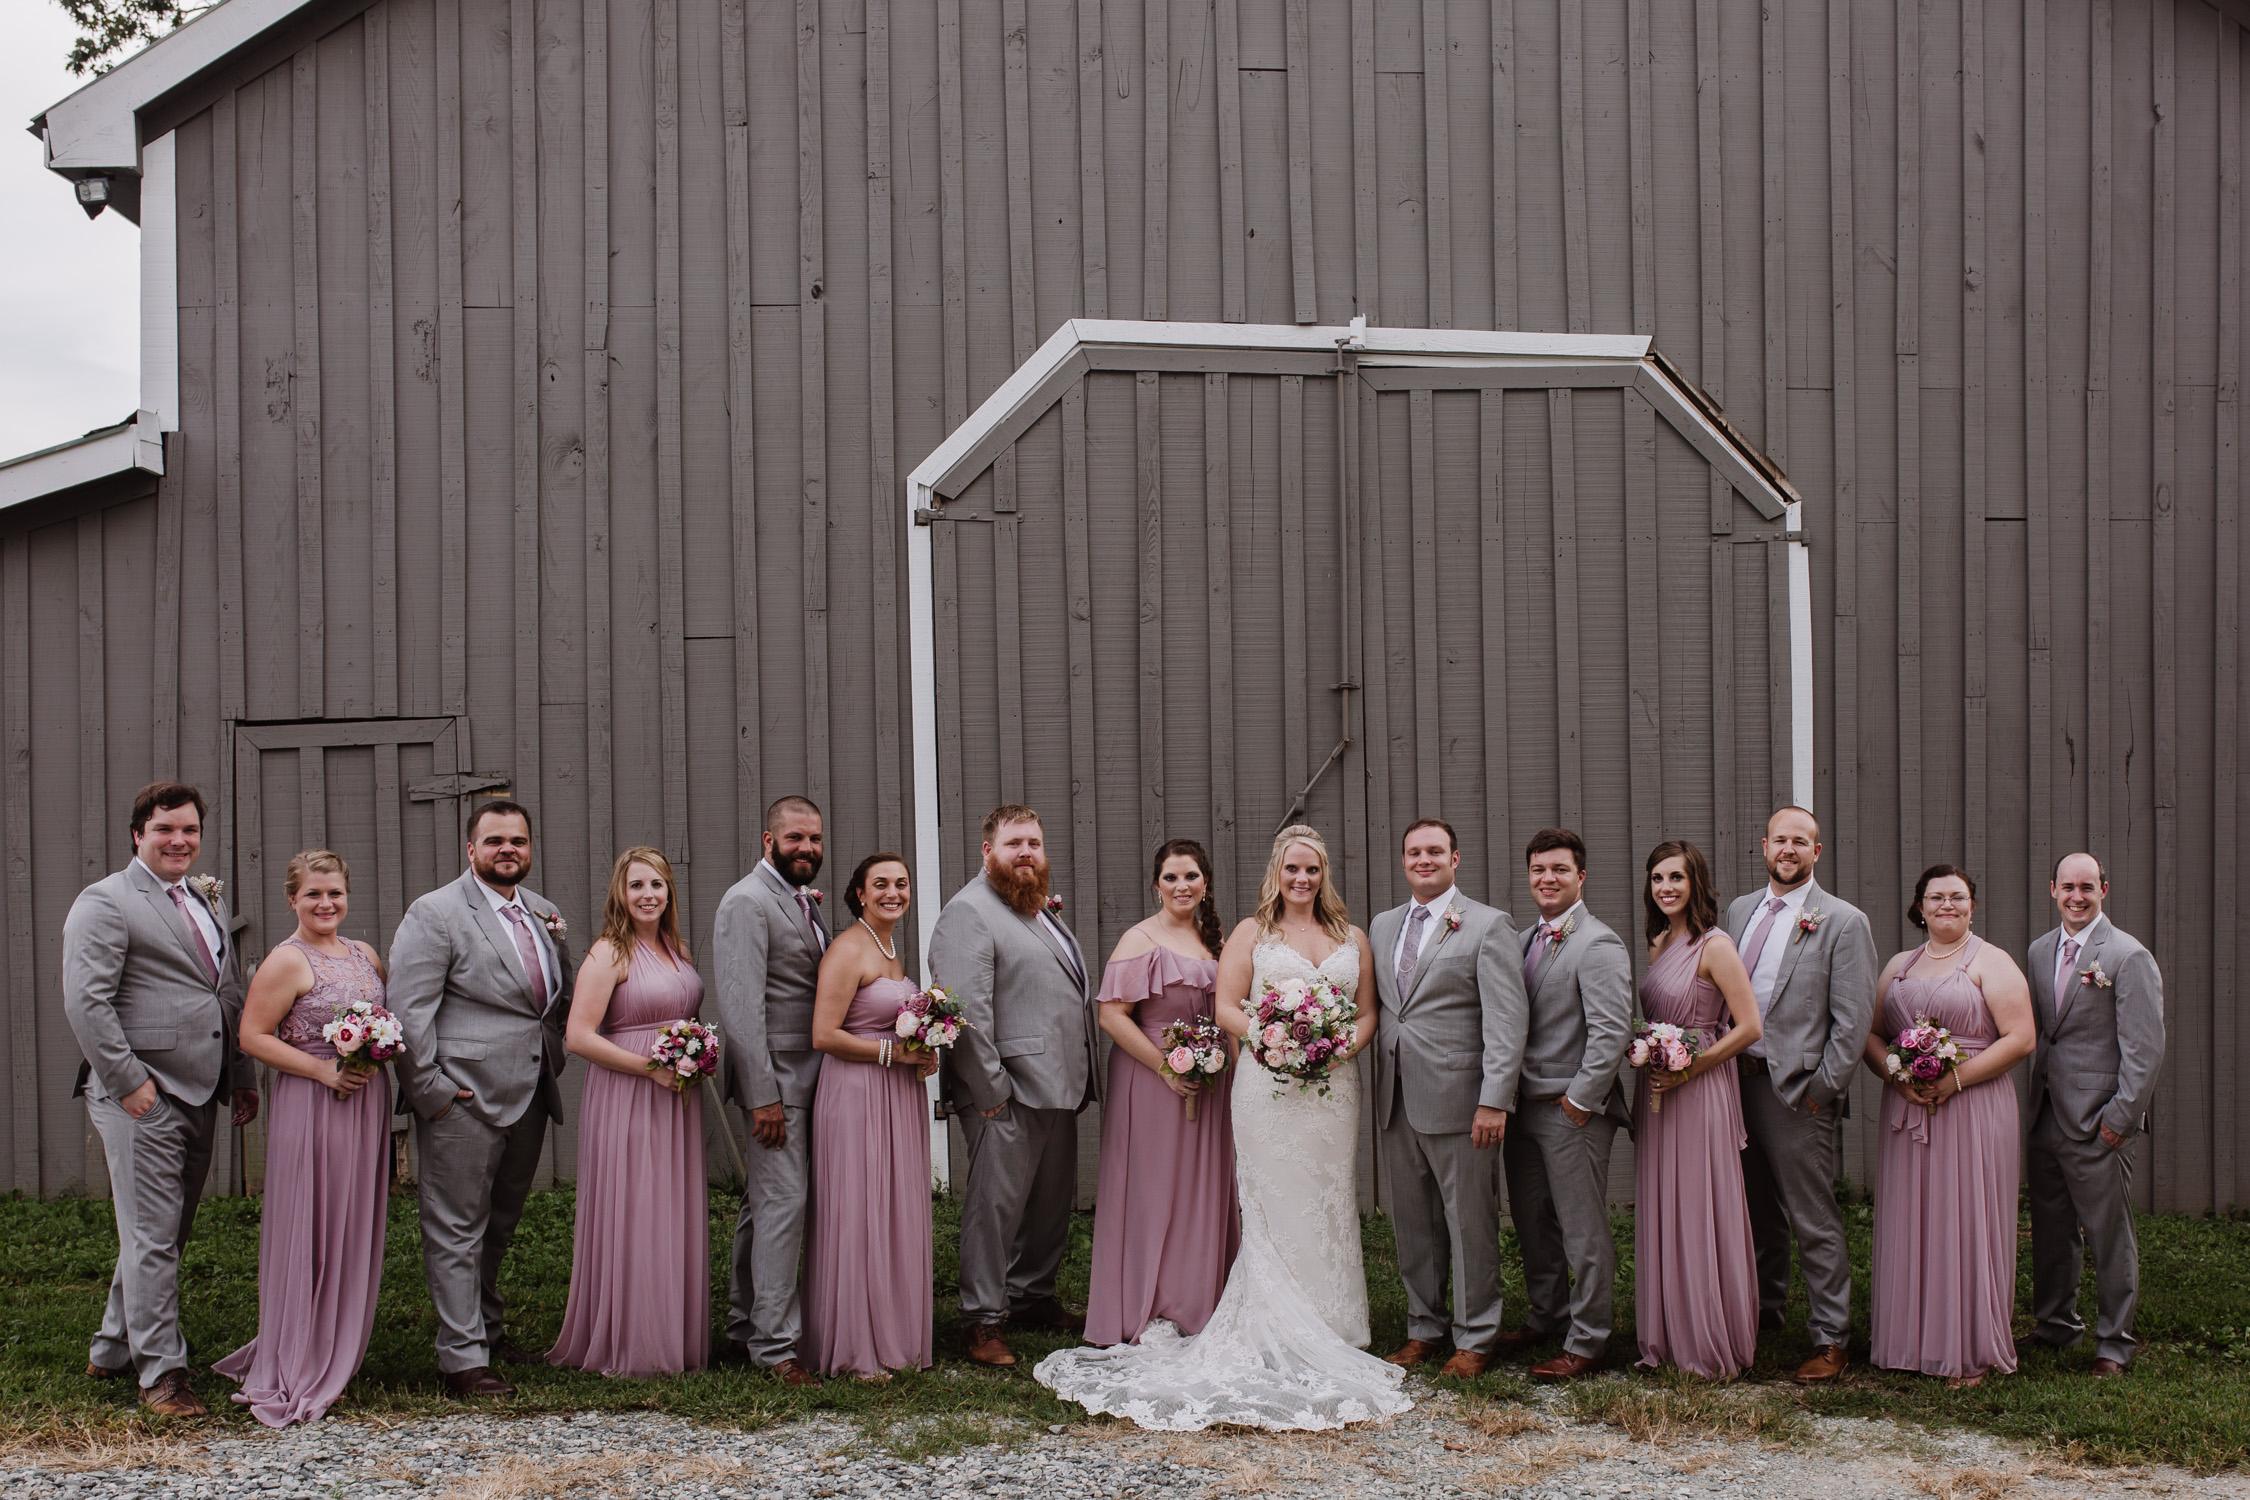 Wedding Party Photos by Kayli LaFon Photography | Greensboro Winston-Salem, NC Wedding Photographer | The Hideaway at Crooked Creek, Whitsett